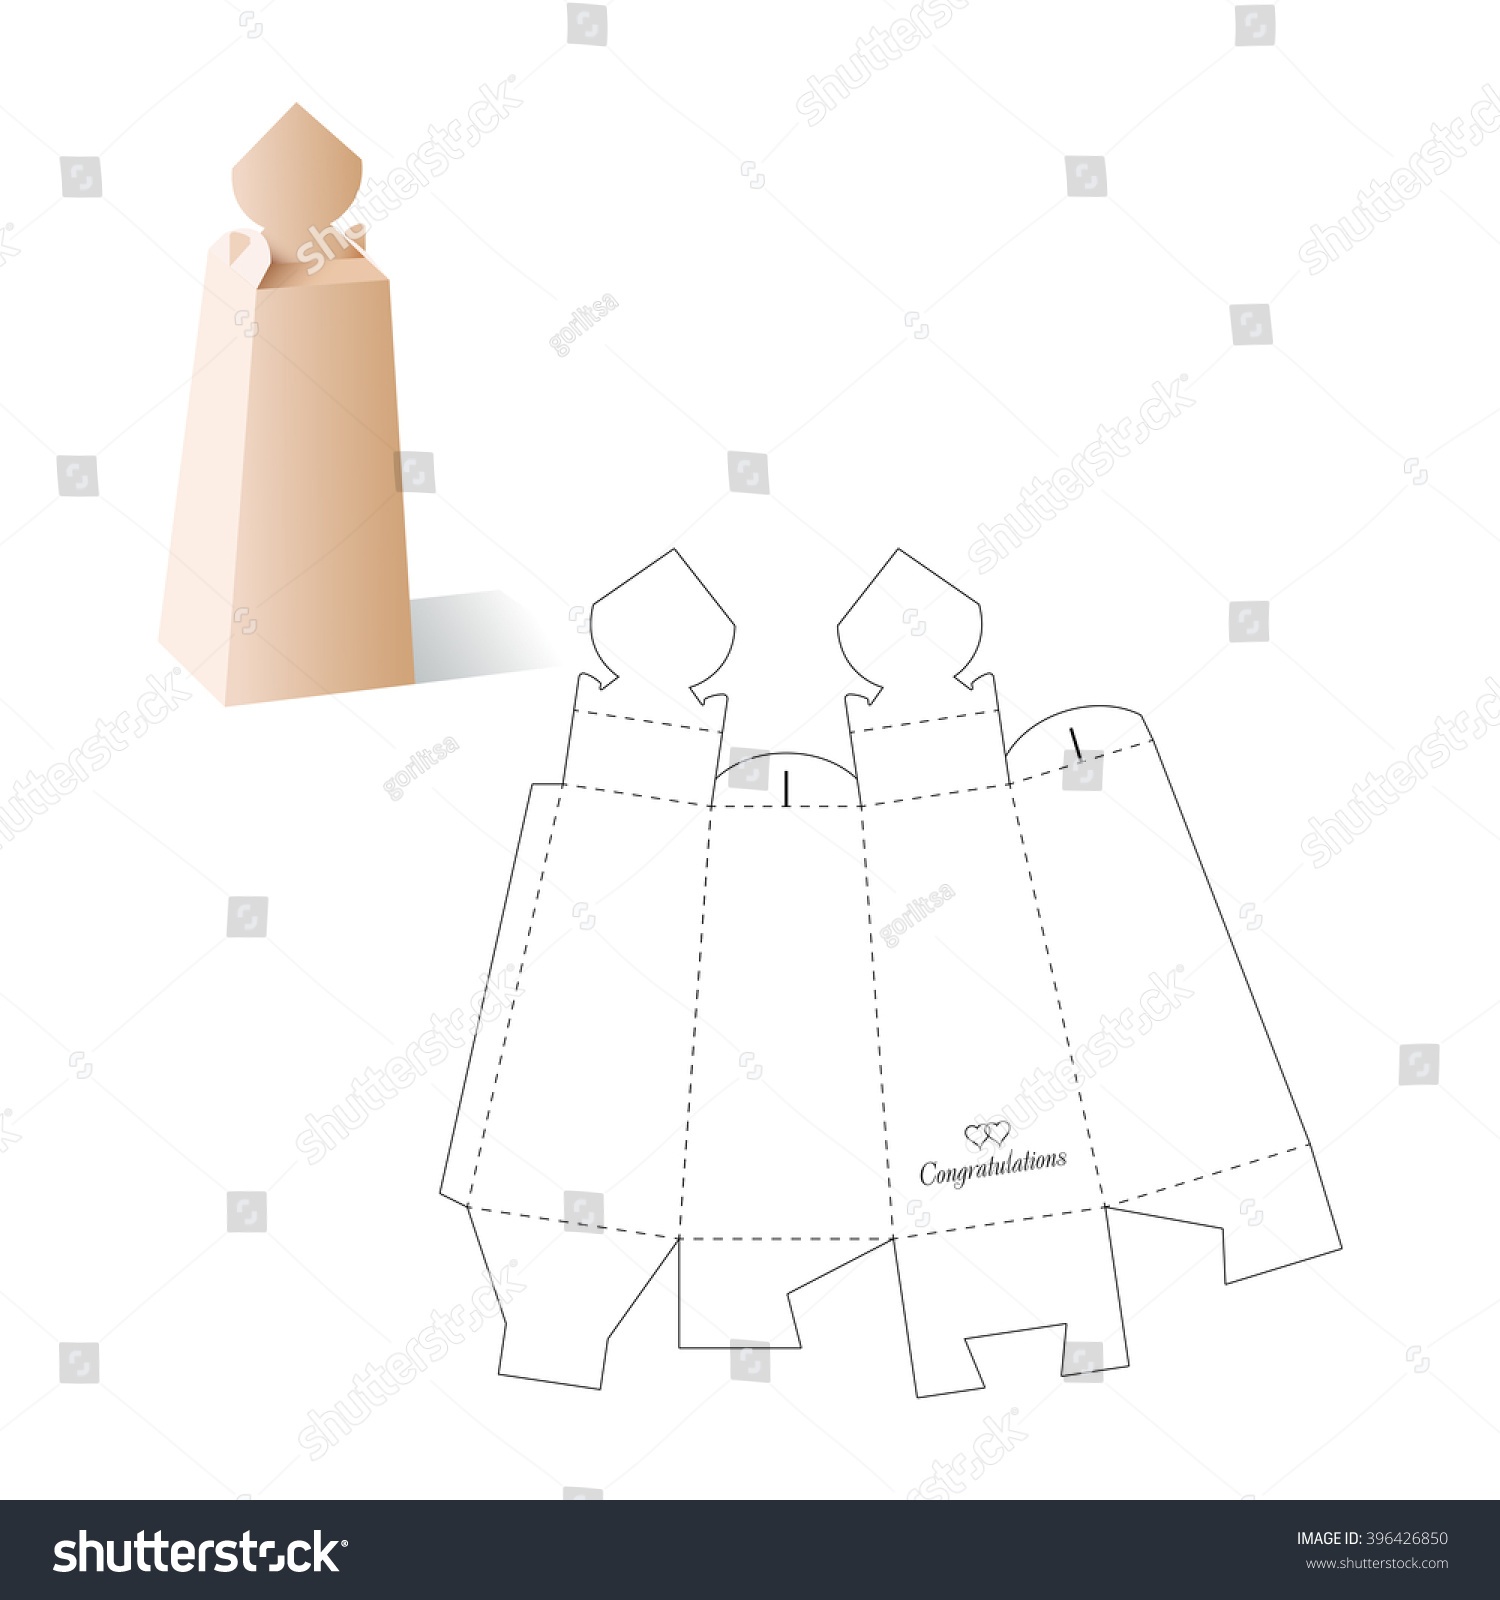 Retail box blueprint template vectores en stock 396426850 shutterstock malvernweather Images